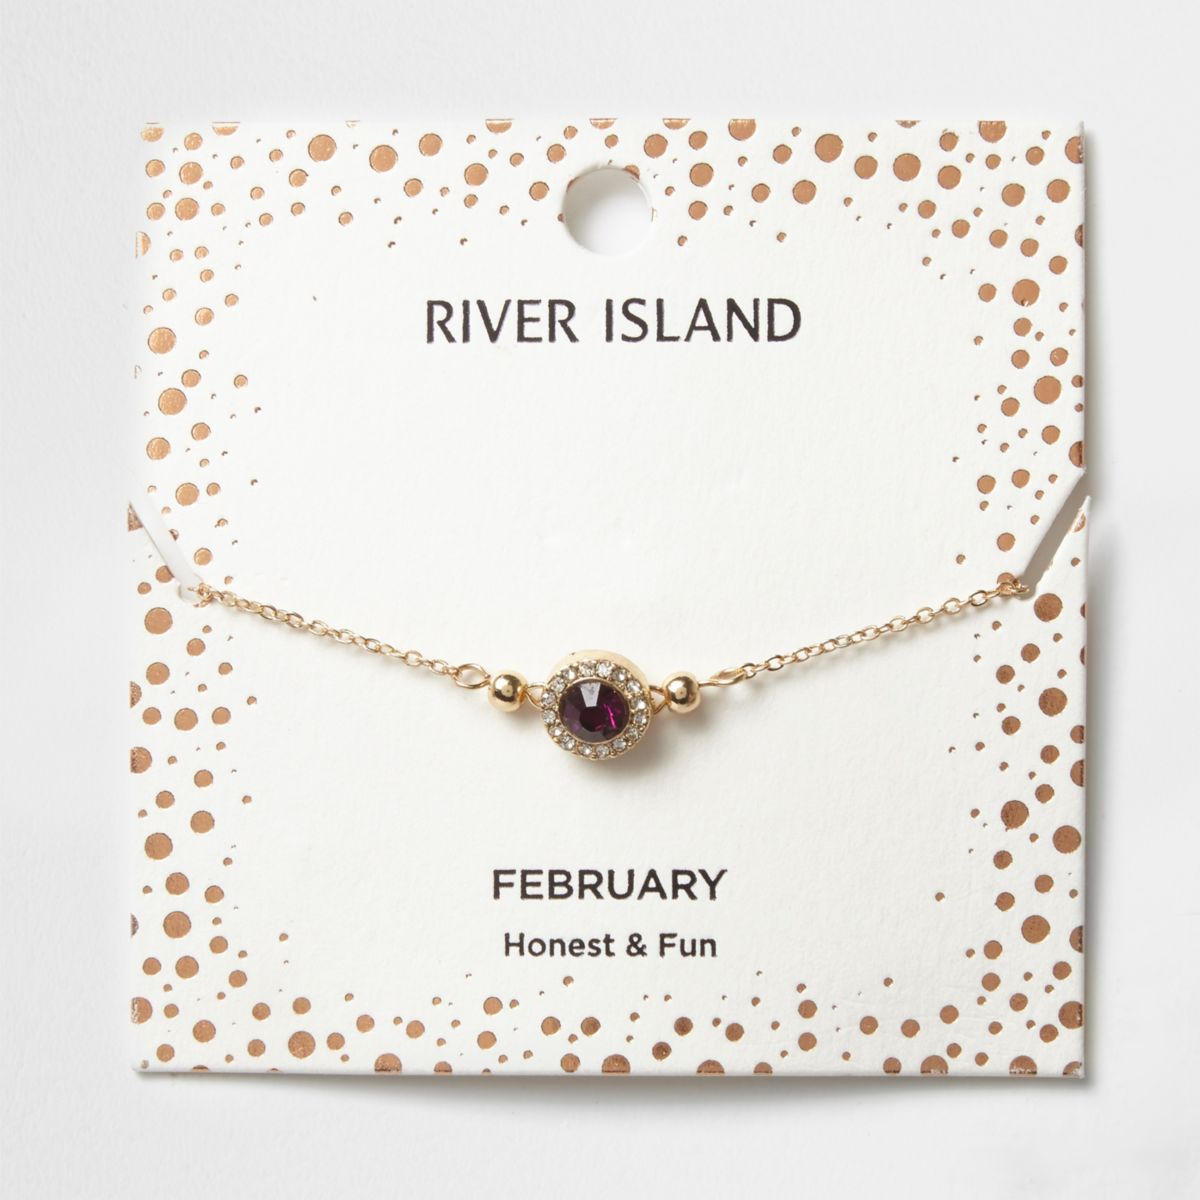 Armband mit lilafarbenem Geburtsstein des Monats Februar